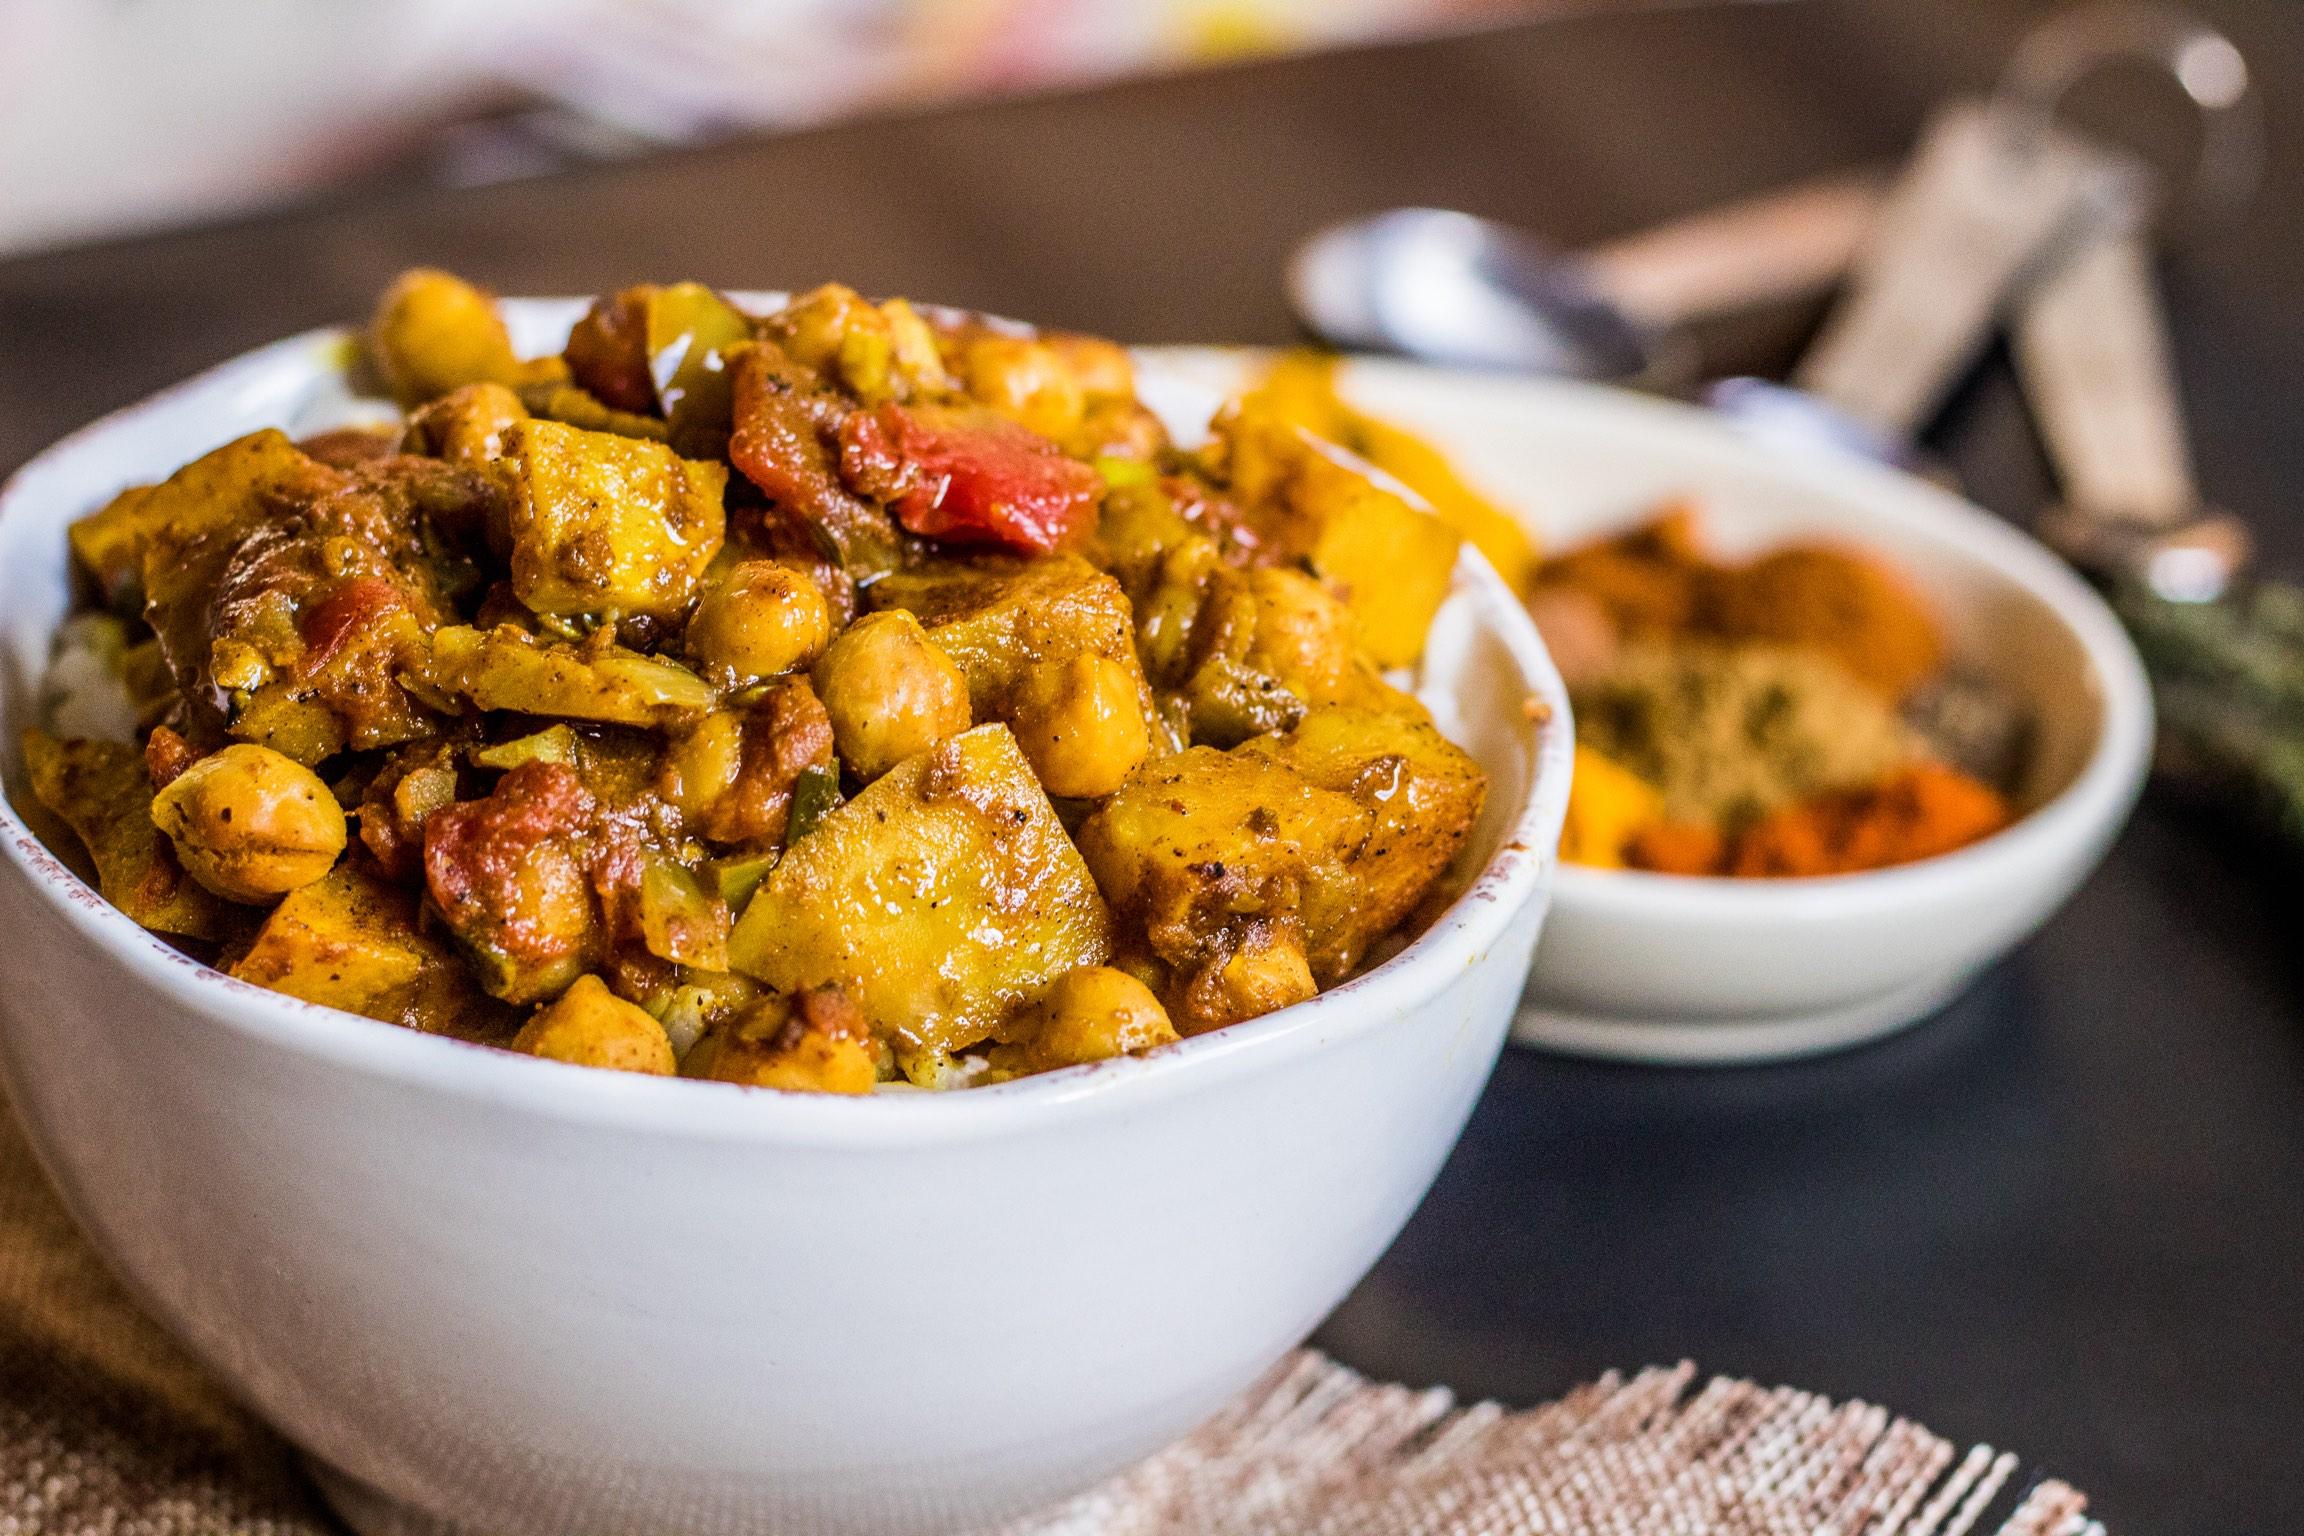 Sweet potato and chana (chickpea) curry